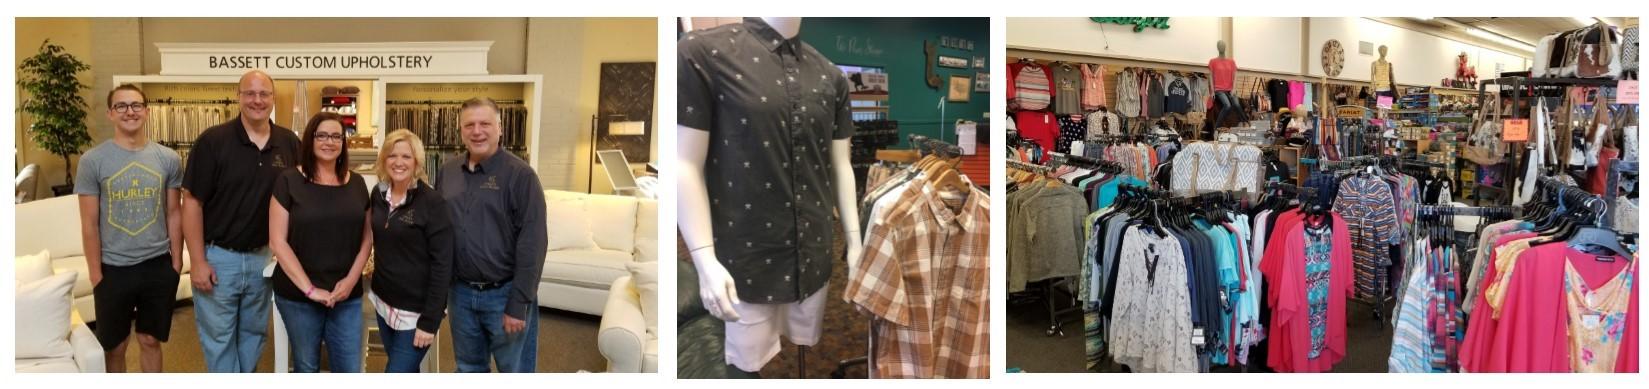 Shopping-Spotlight-webpage-pics-(2).jpg